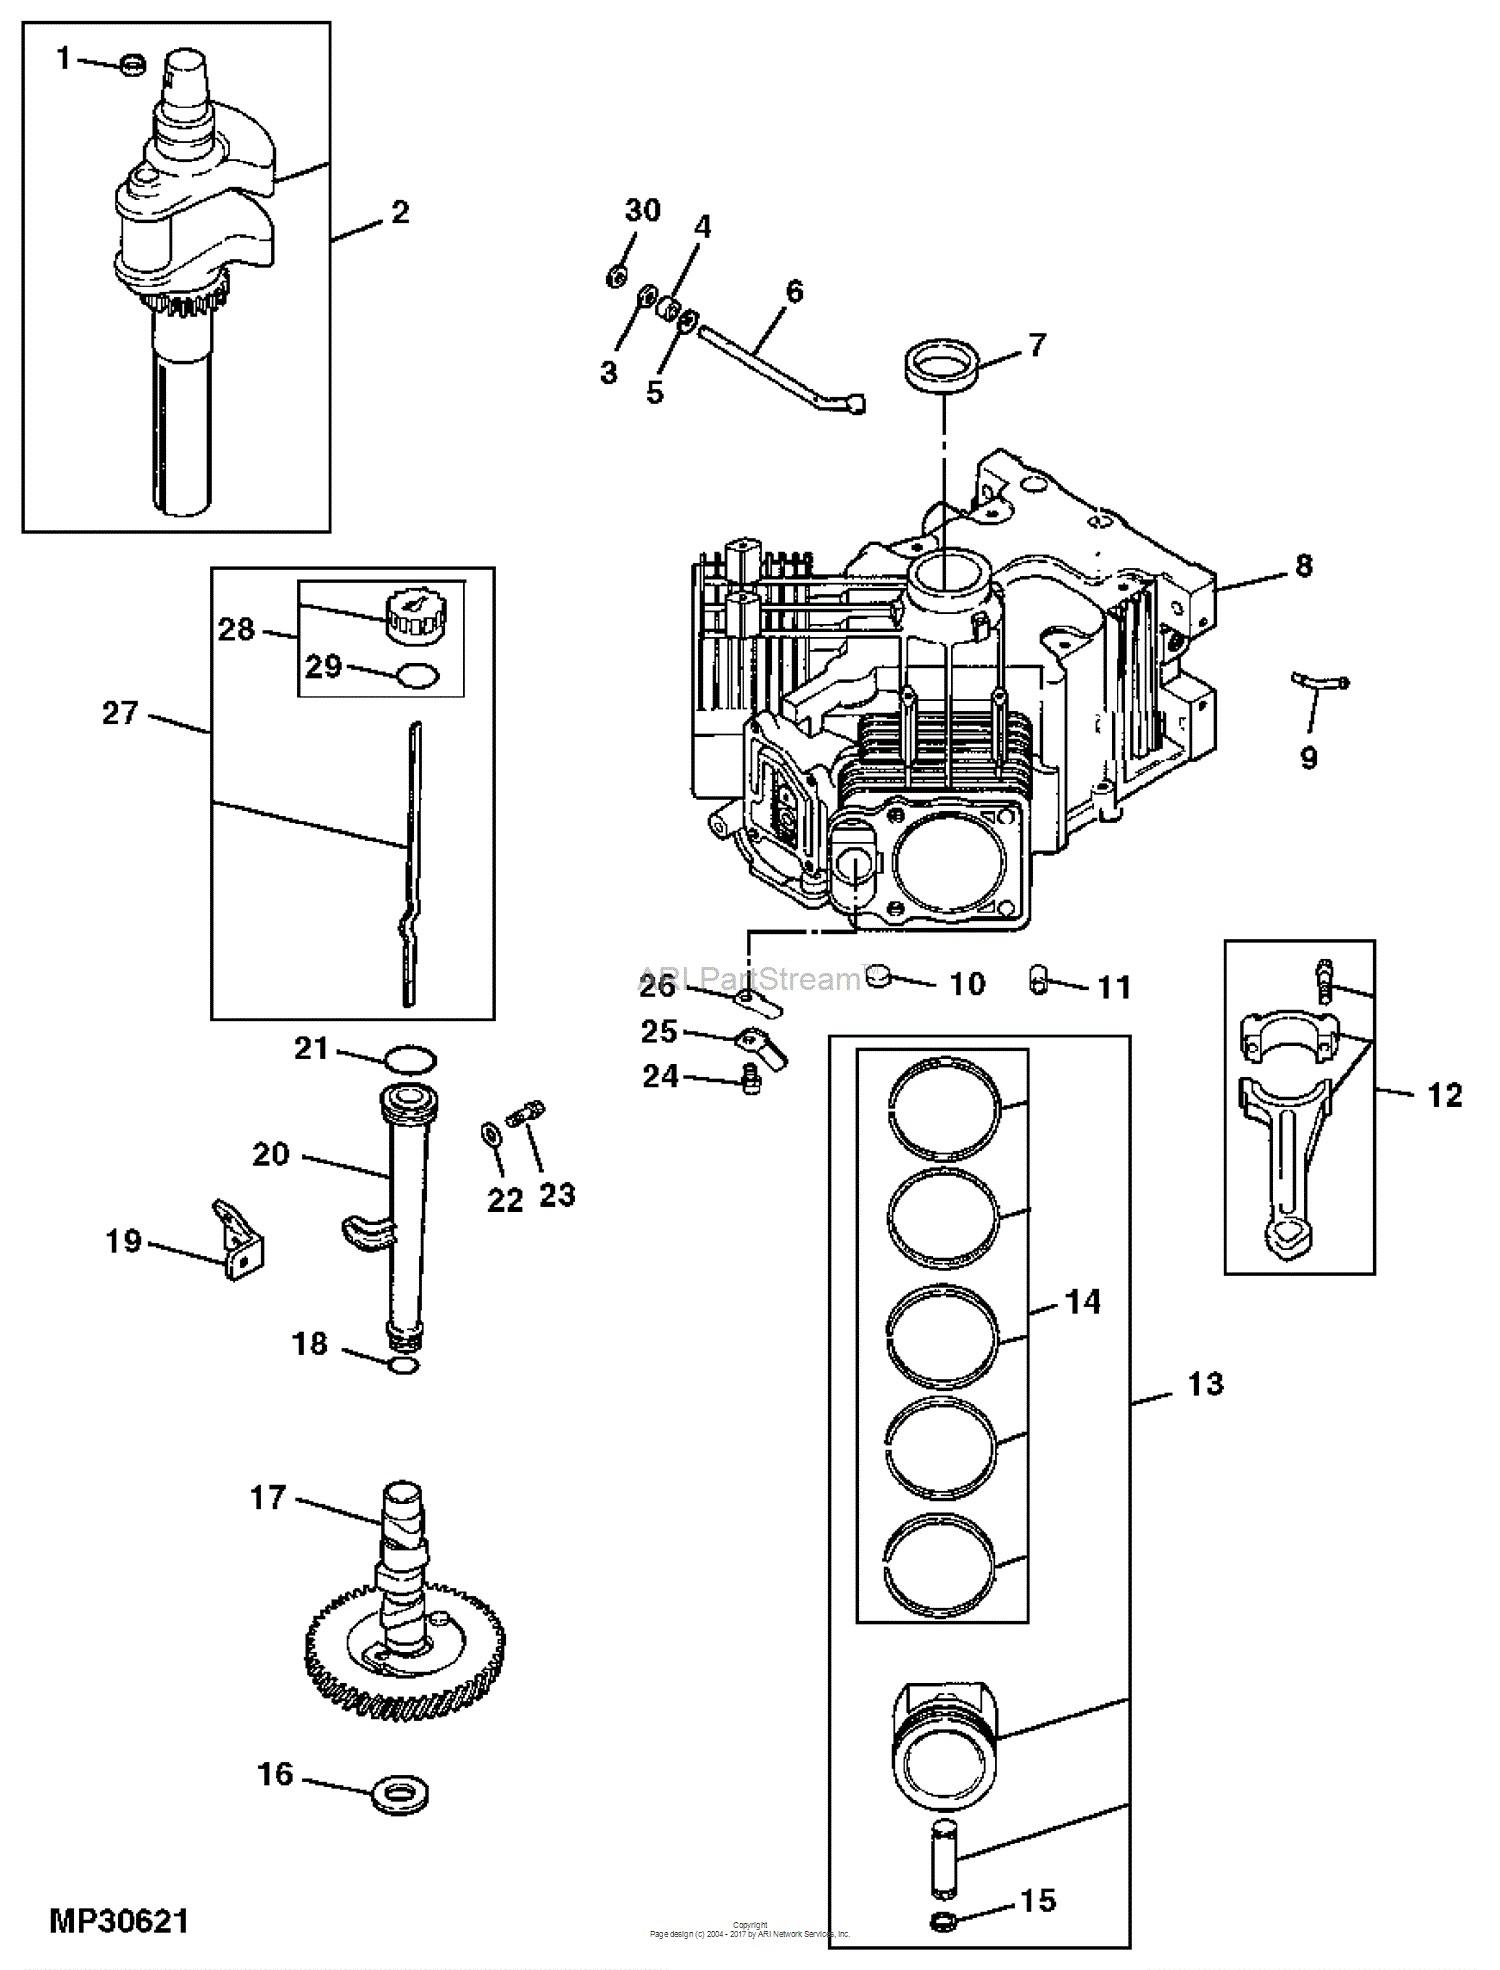 Piston Parts Diagram John Deere Parts Diagrams John Deere L130 Lawn Tractor Pc9291 Of Piston Parts Diagram